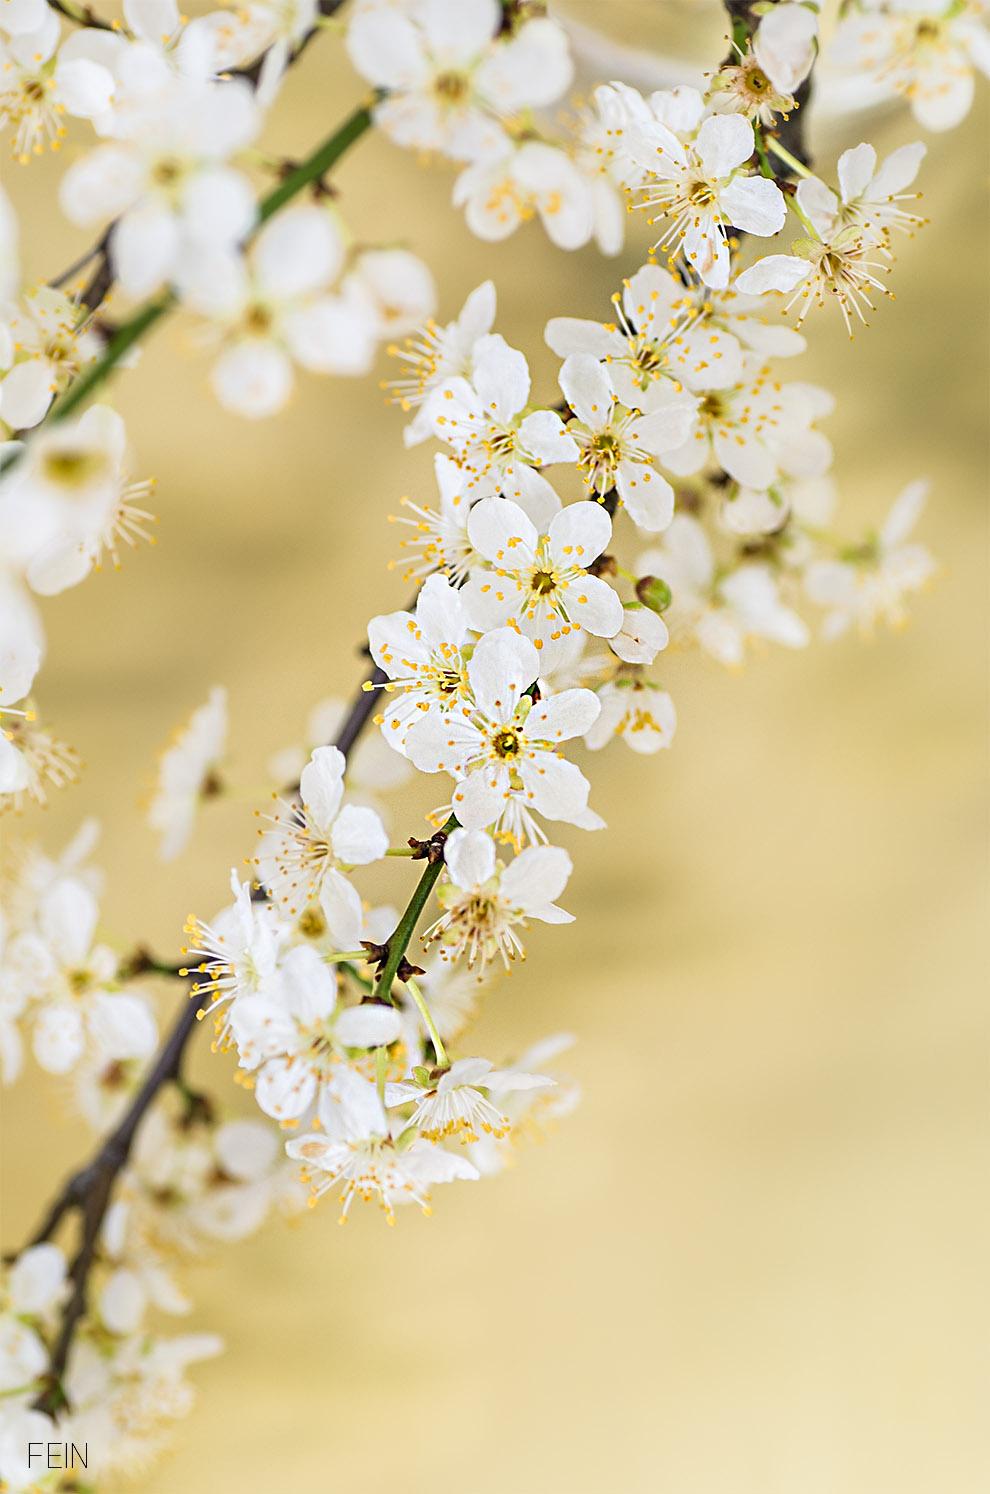 Marmor Schlehenblüten